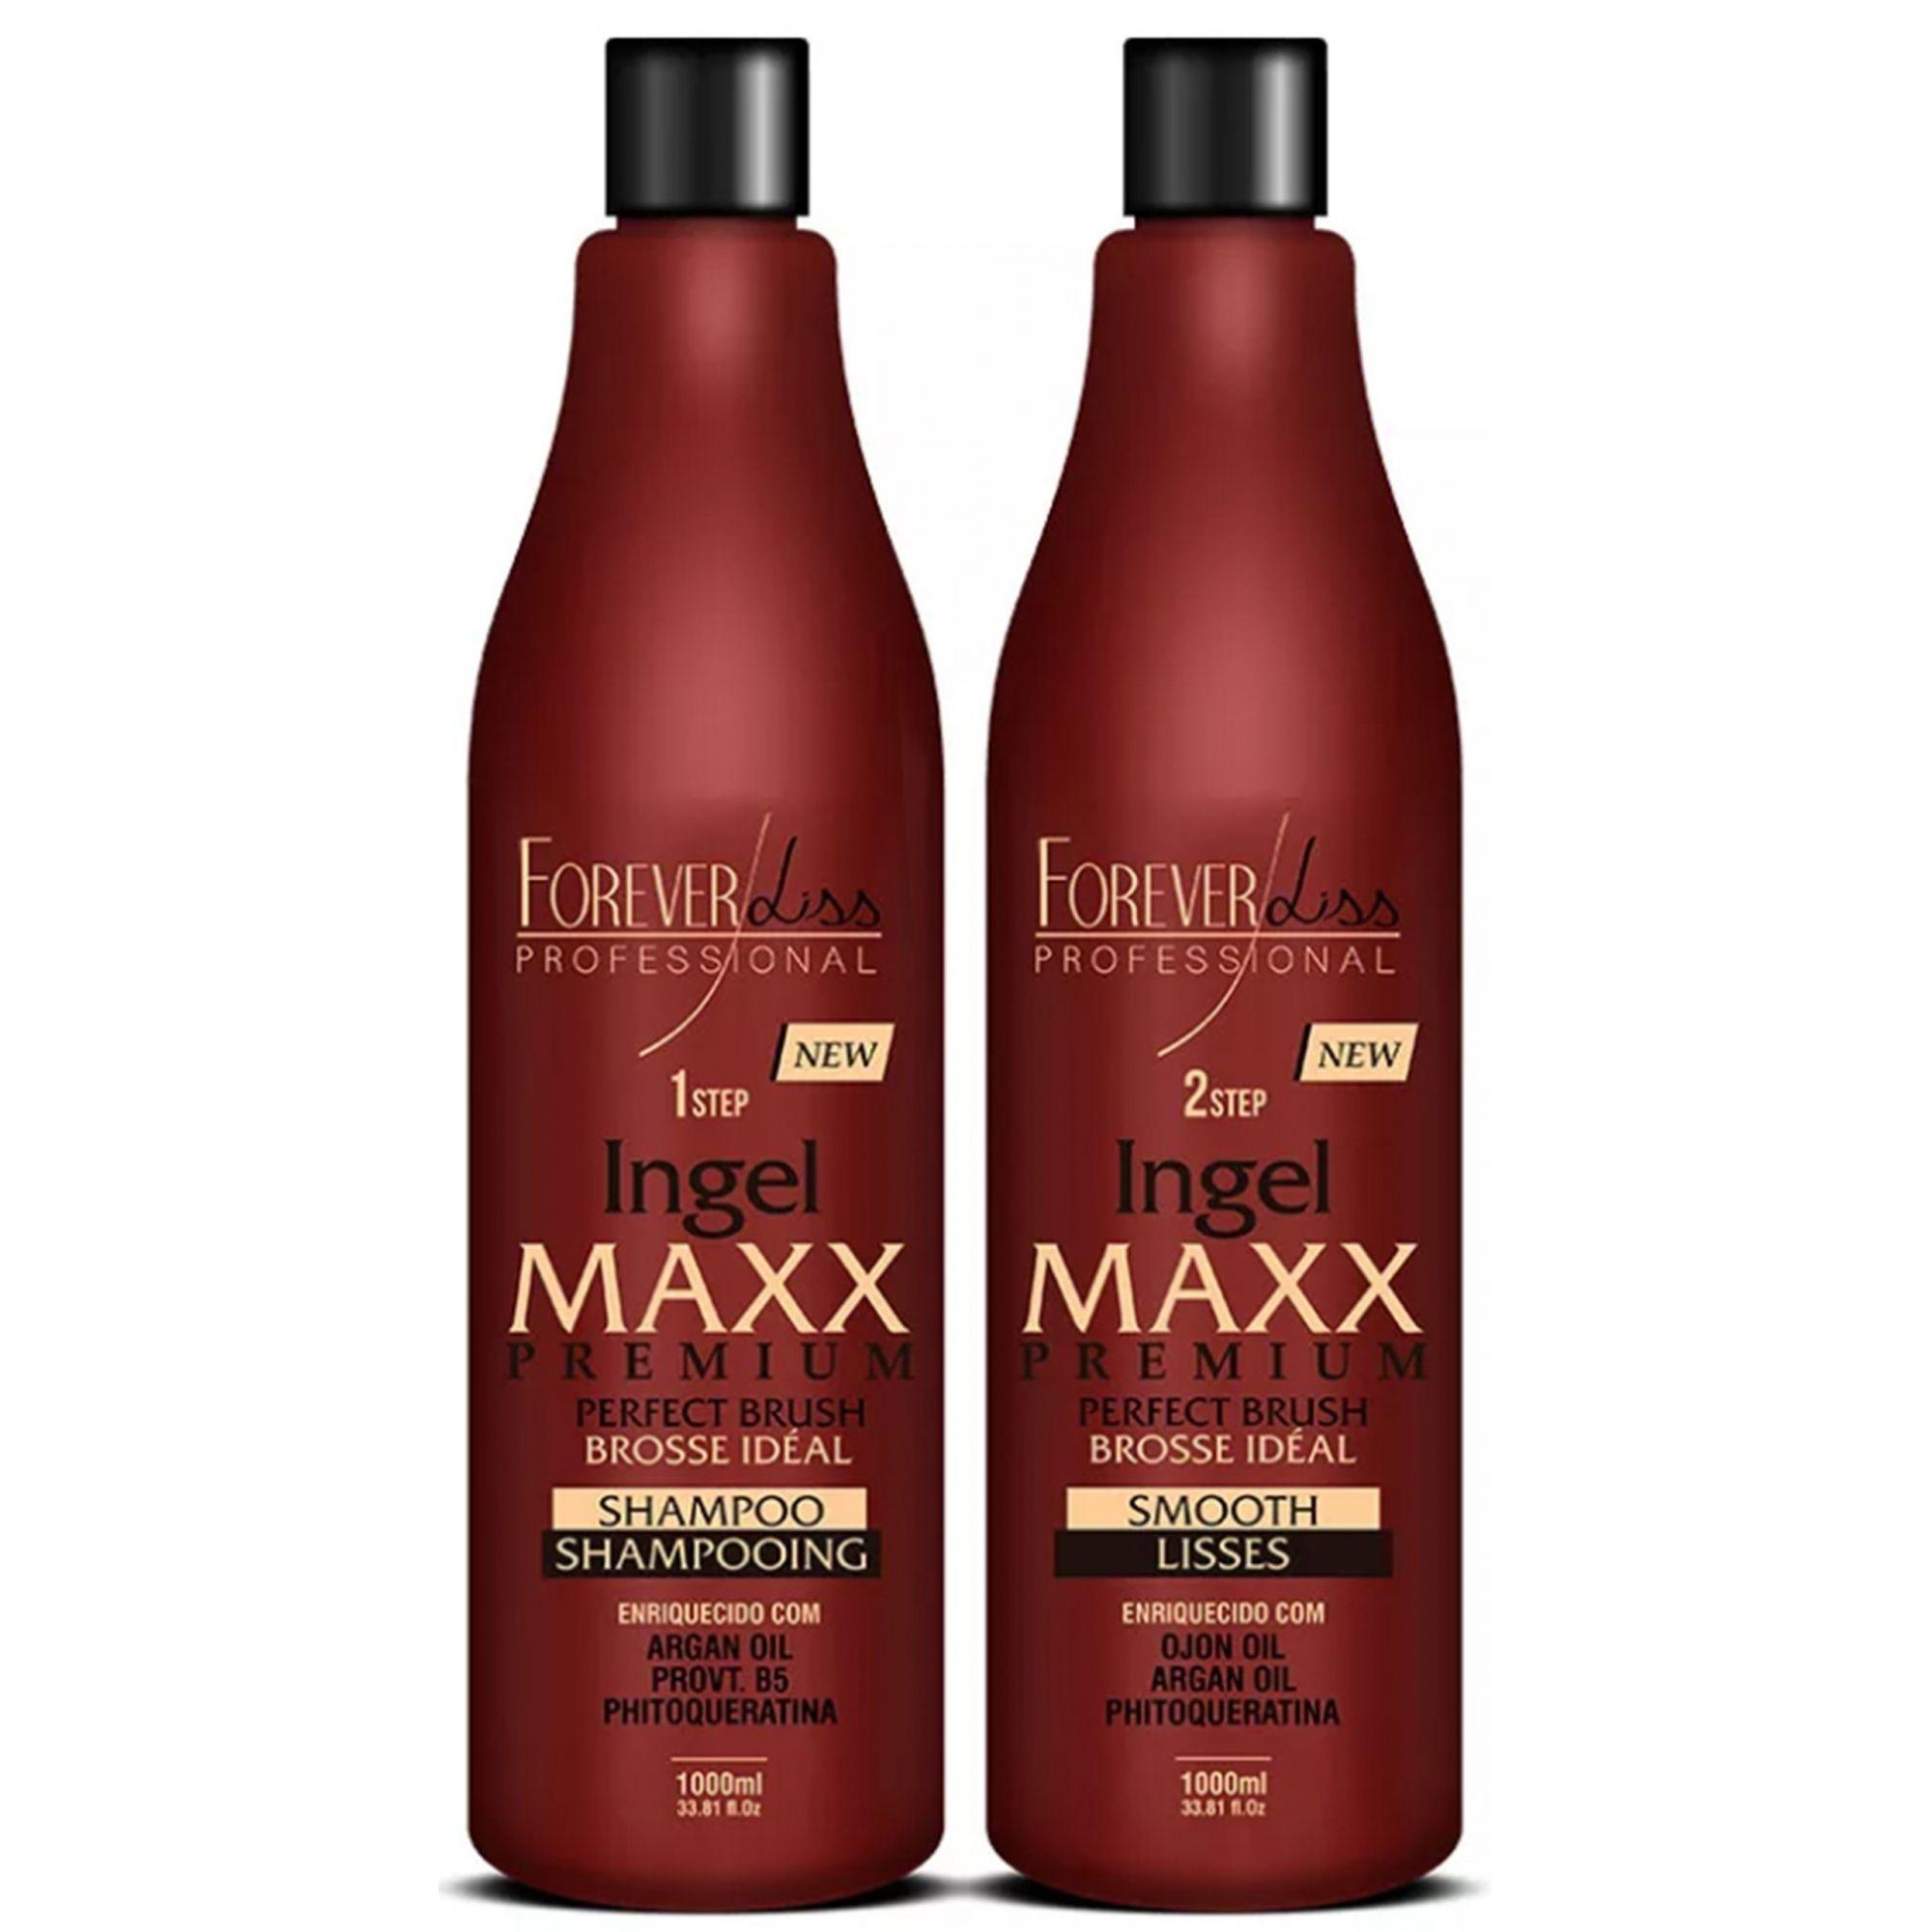 Escova Progressiva Ingel Maxx 2 Passos 2x1l Forever Liss